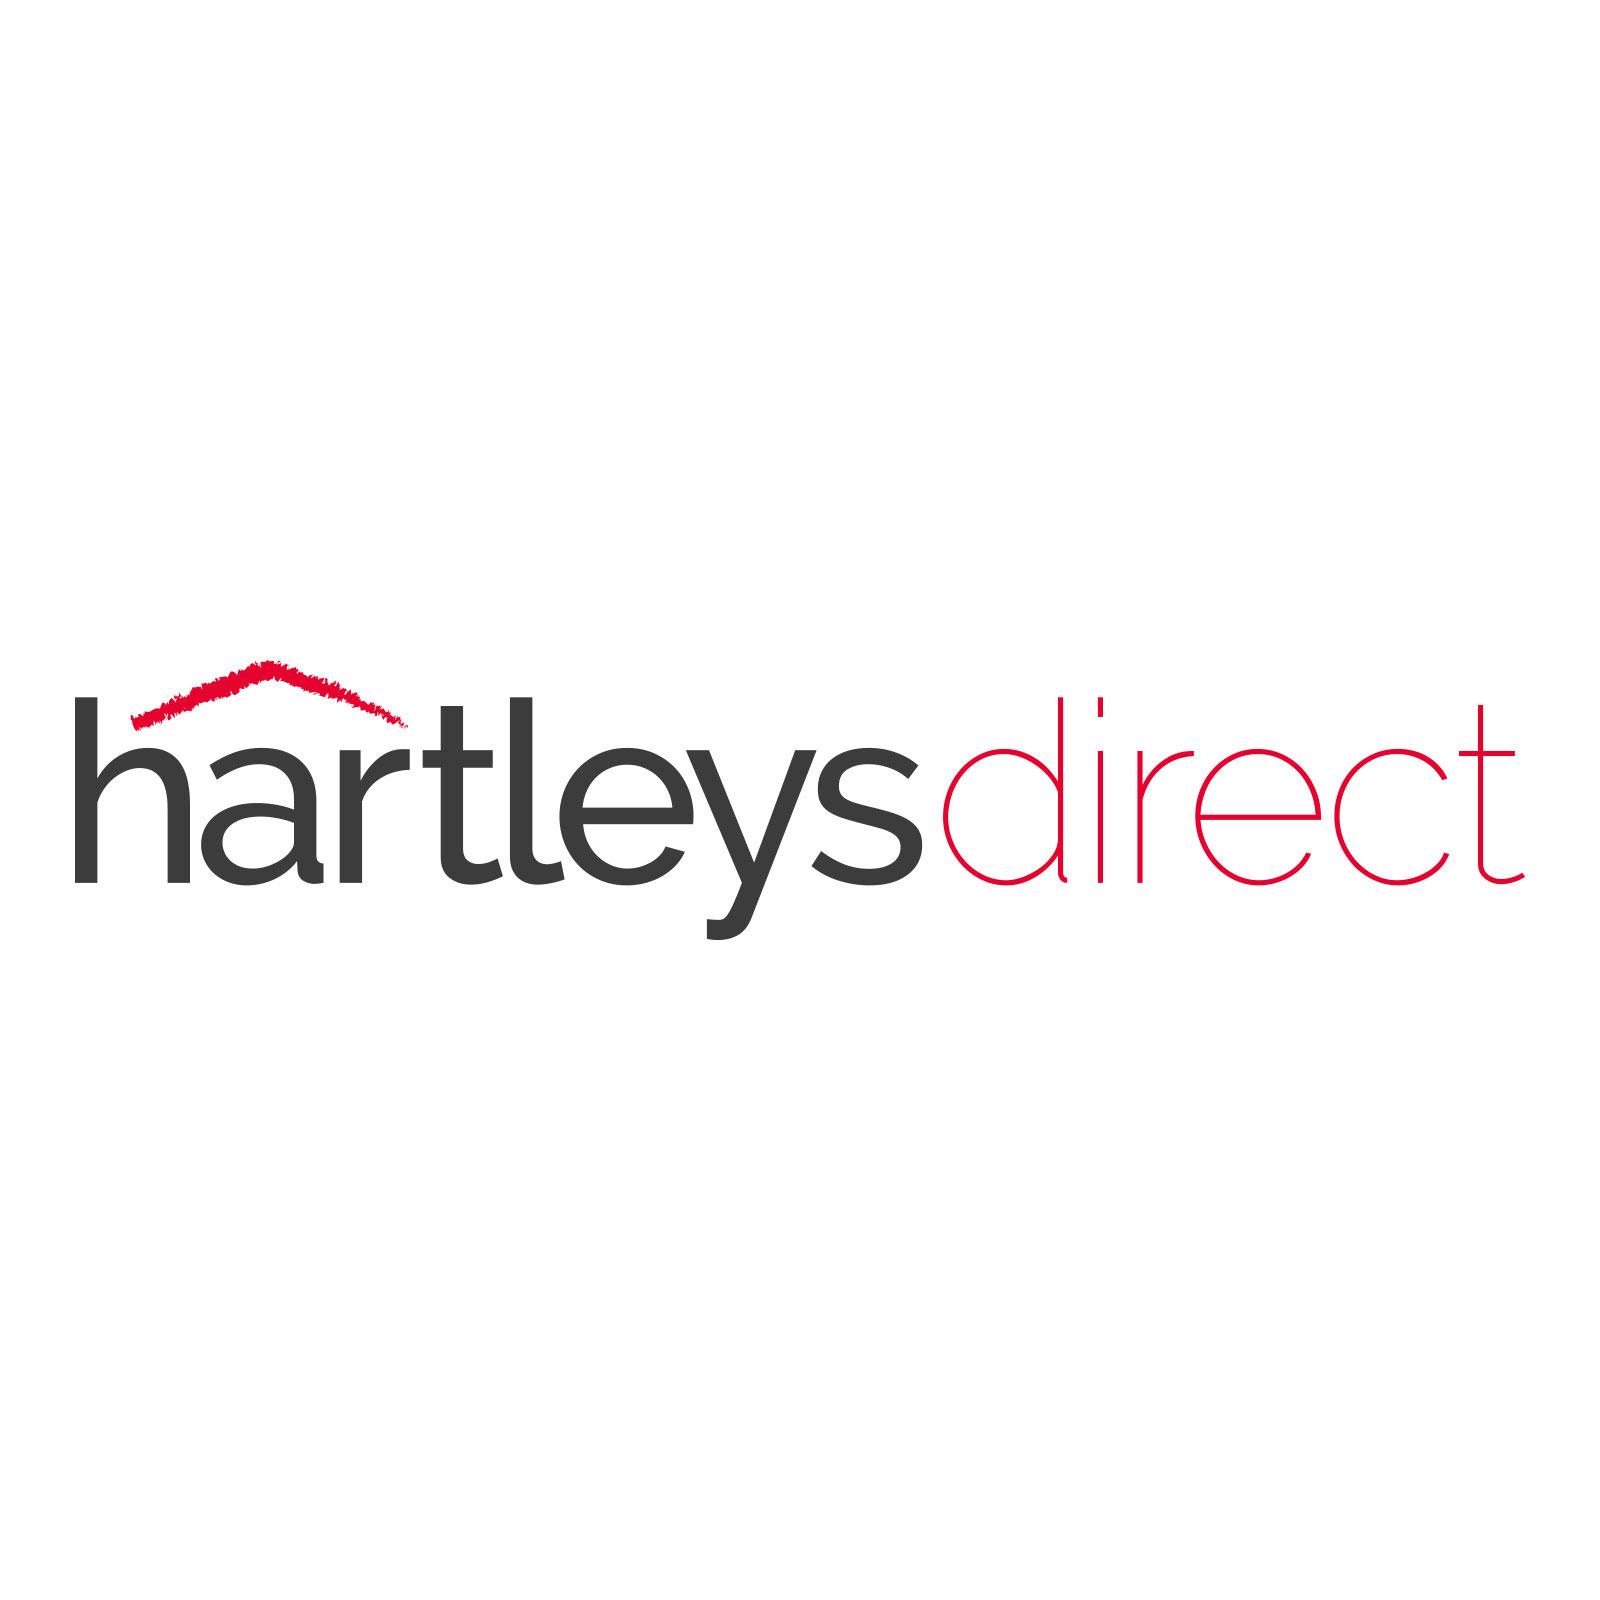 Hartleys-White-9-Cube-Unit-with-4-Black-Box-Drawers-on-White-Background.jpg